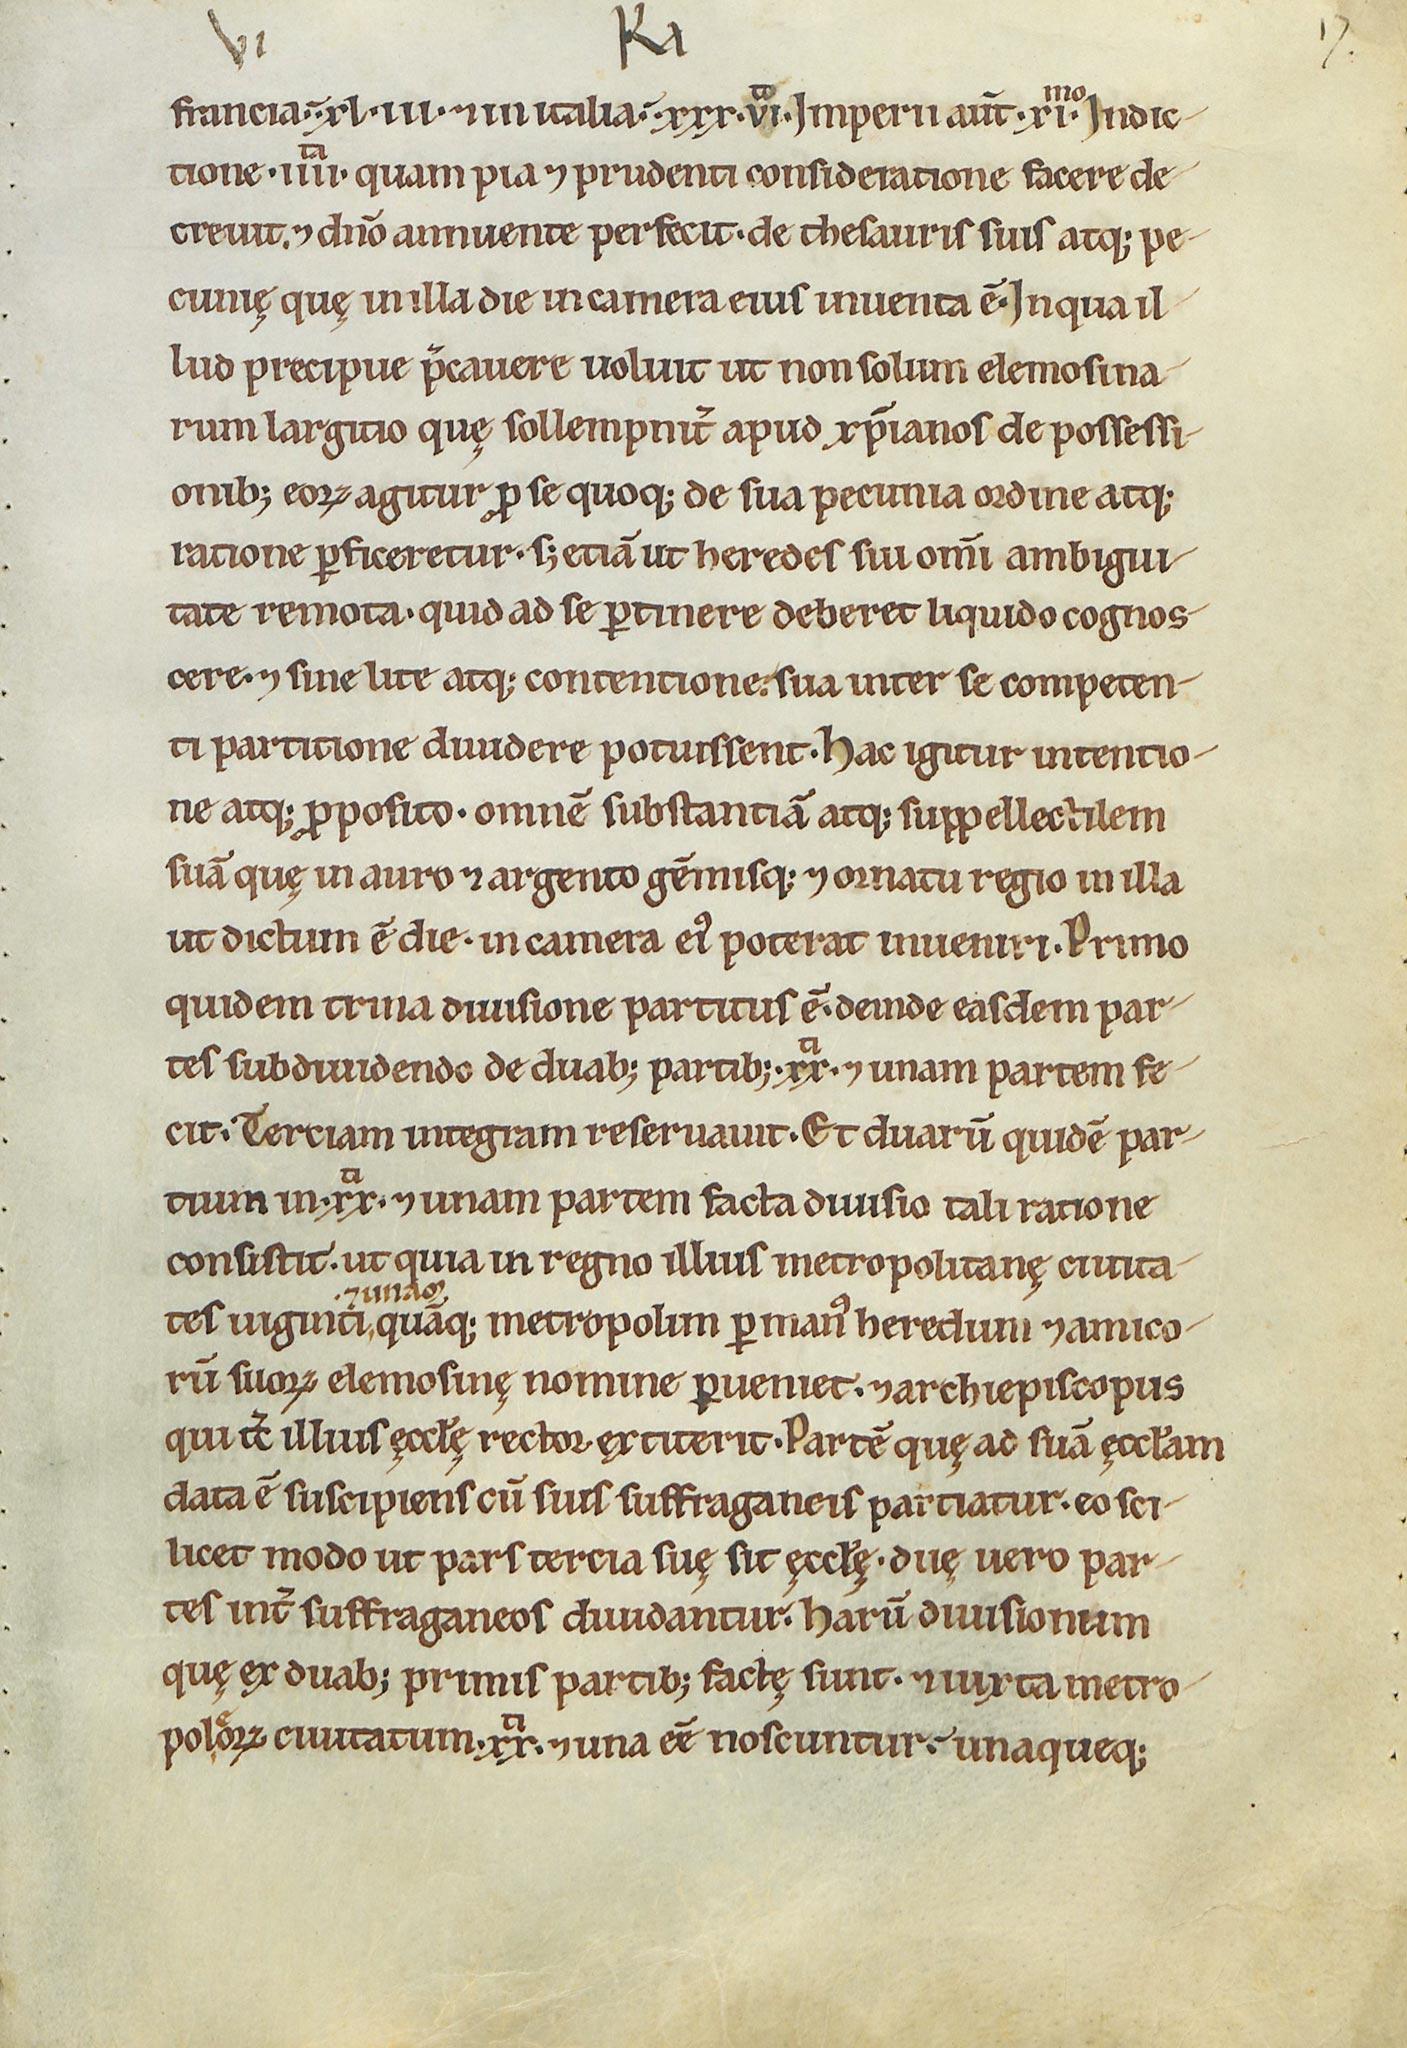 Manuscrit-Vita-Karoli-17r°